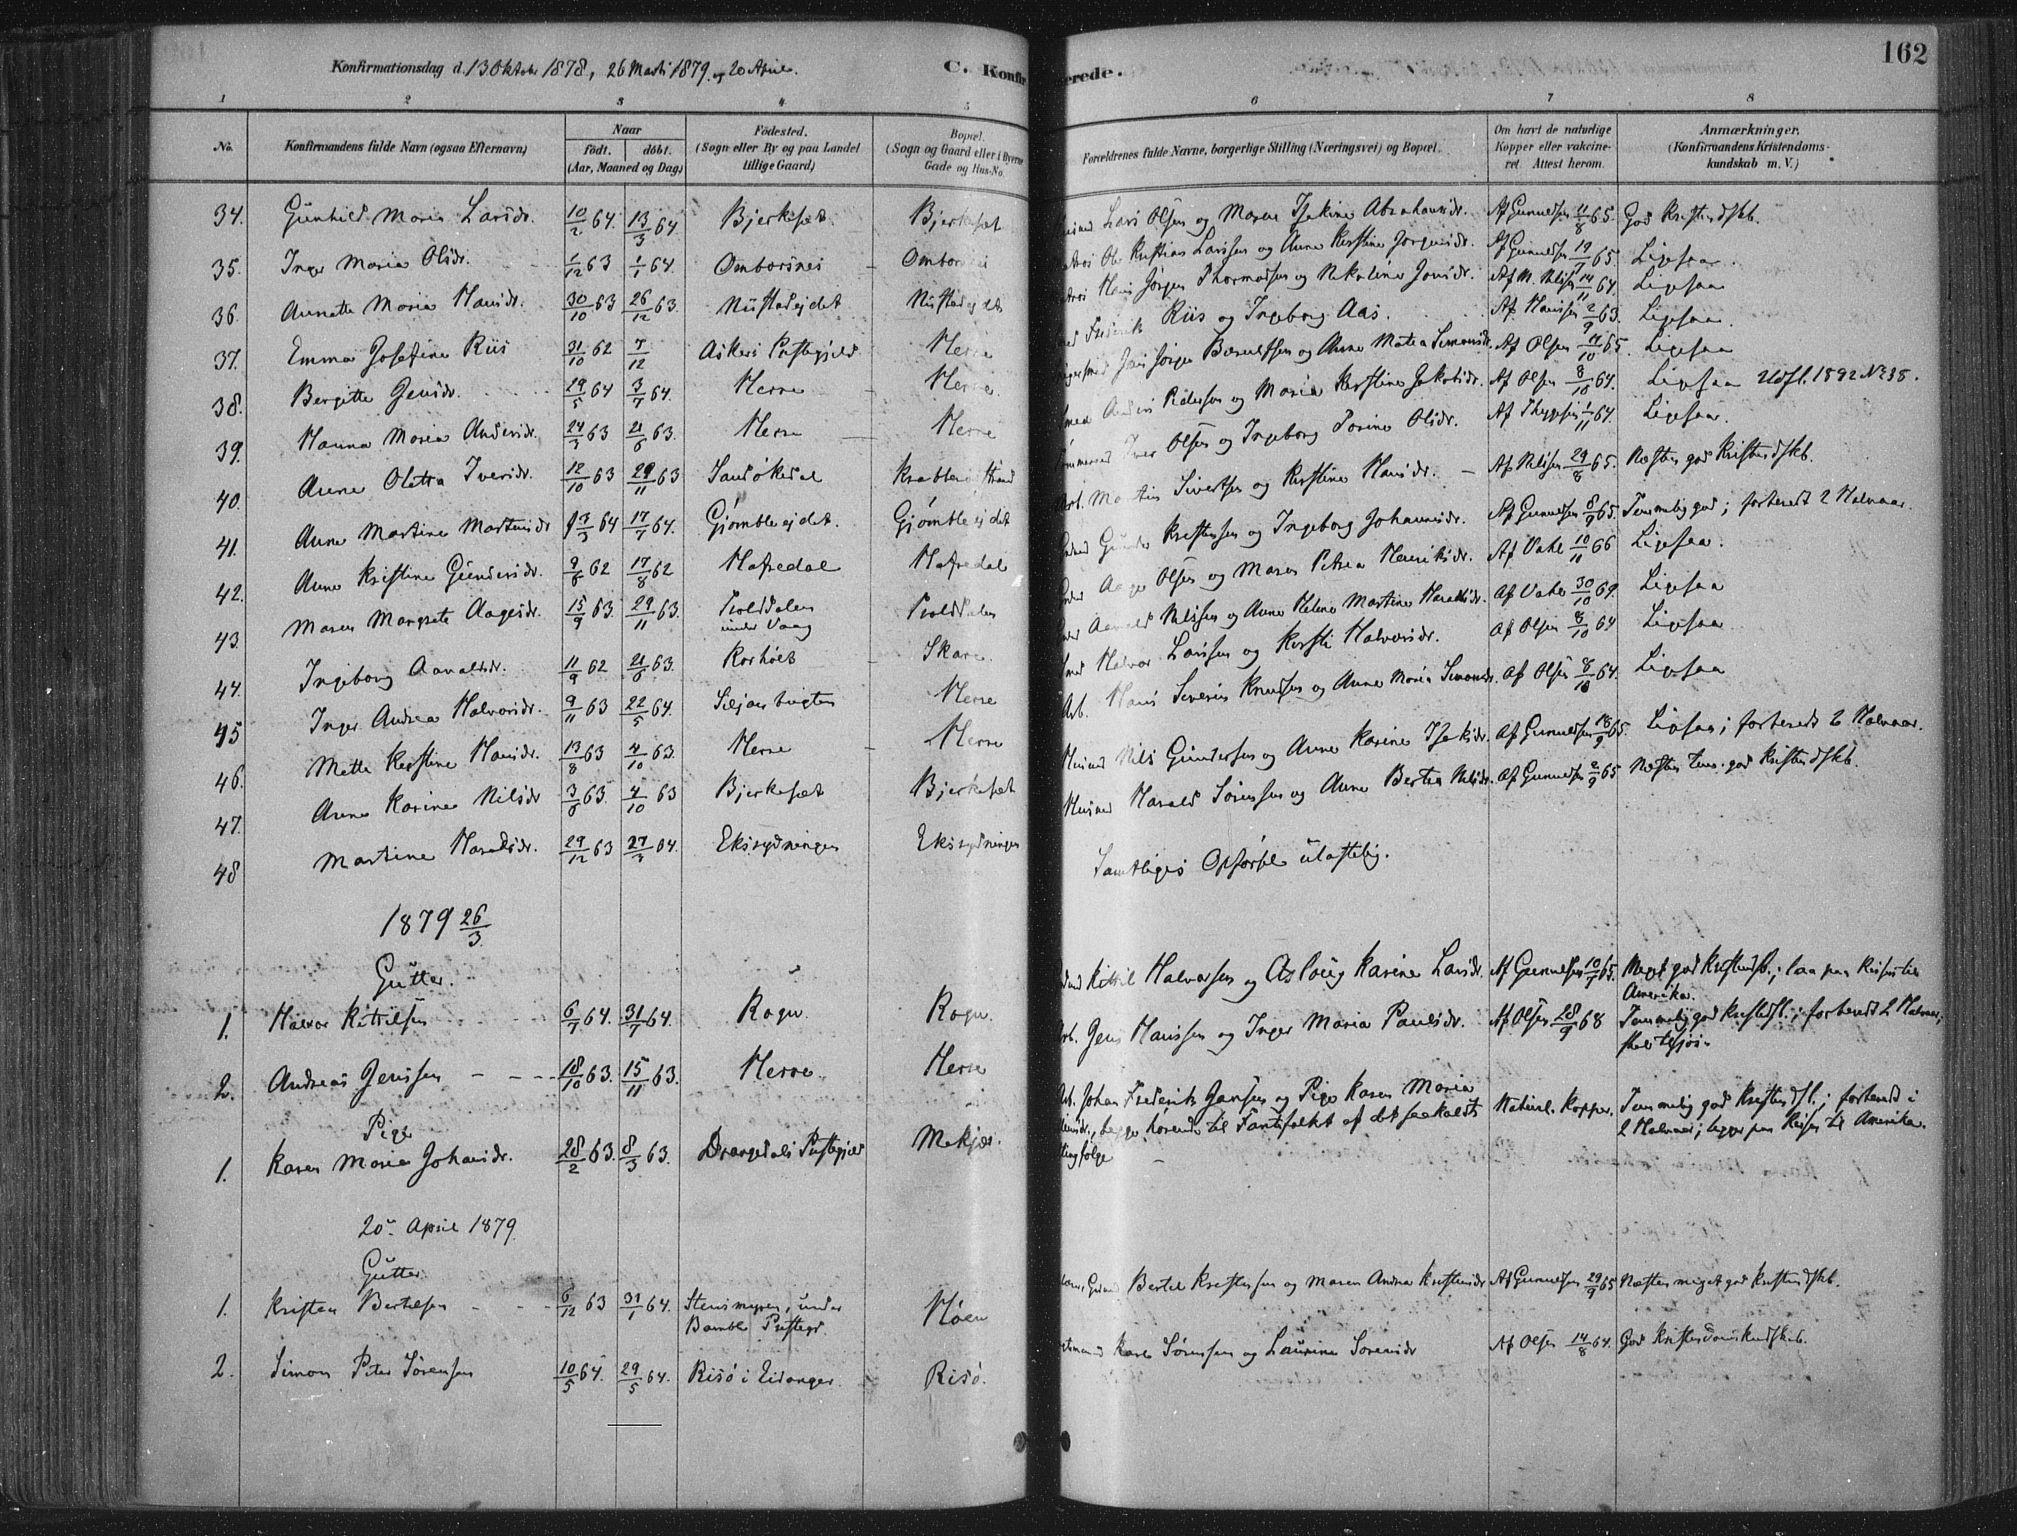 SAKO, Bamble kirkebøker, F/Fa/L0007: Ministerialbok nr. I 7, 1878-1888, s. 162